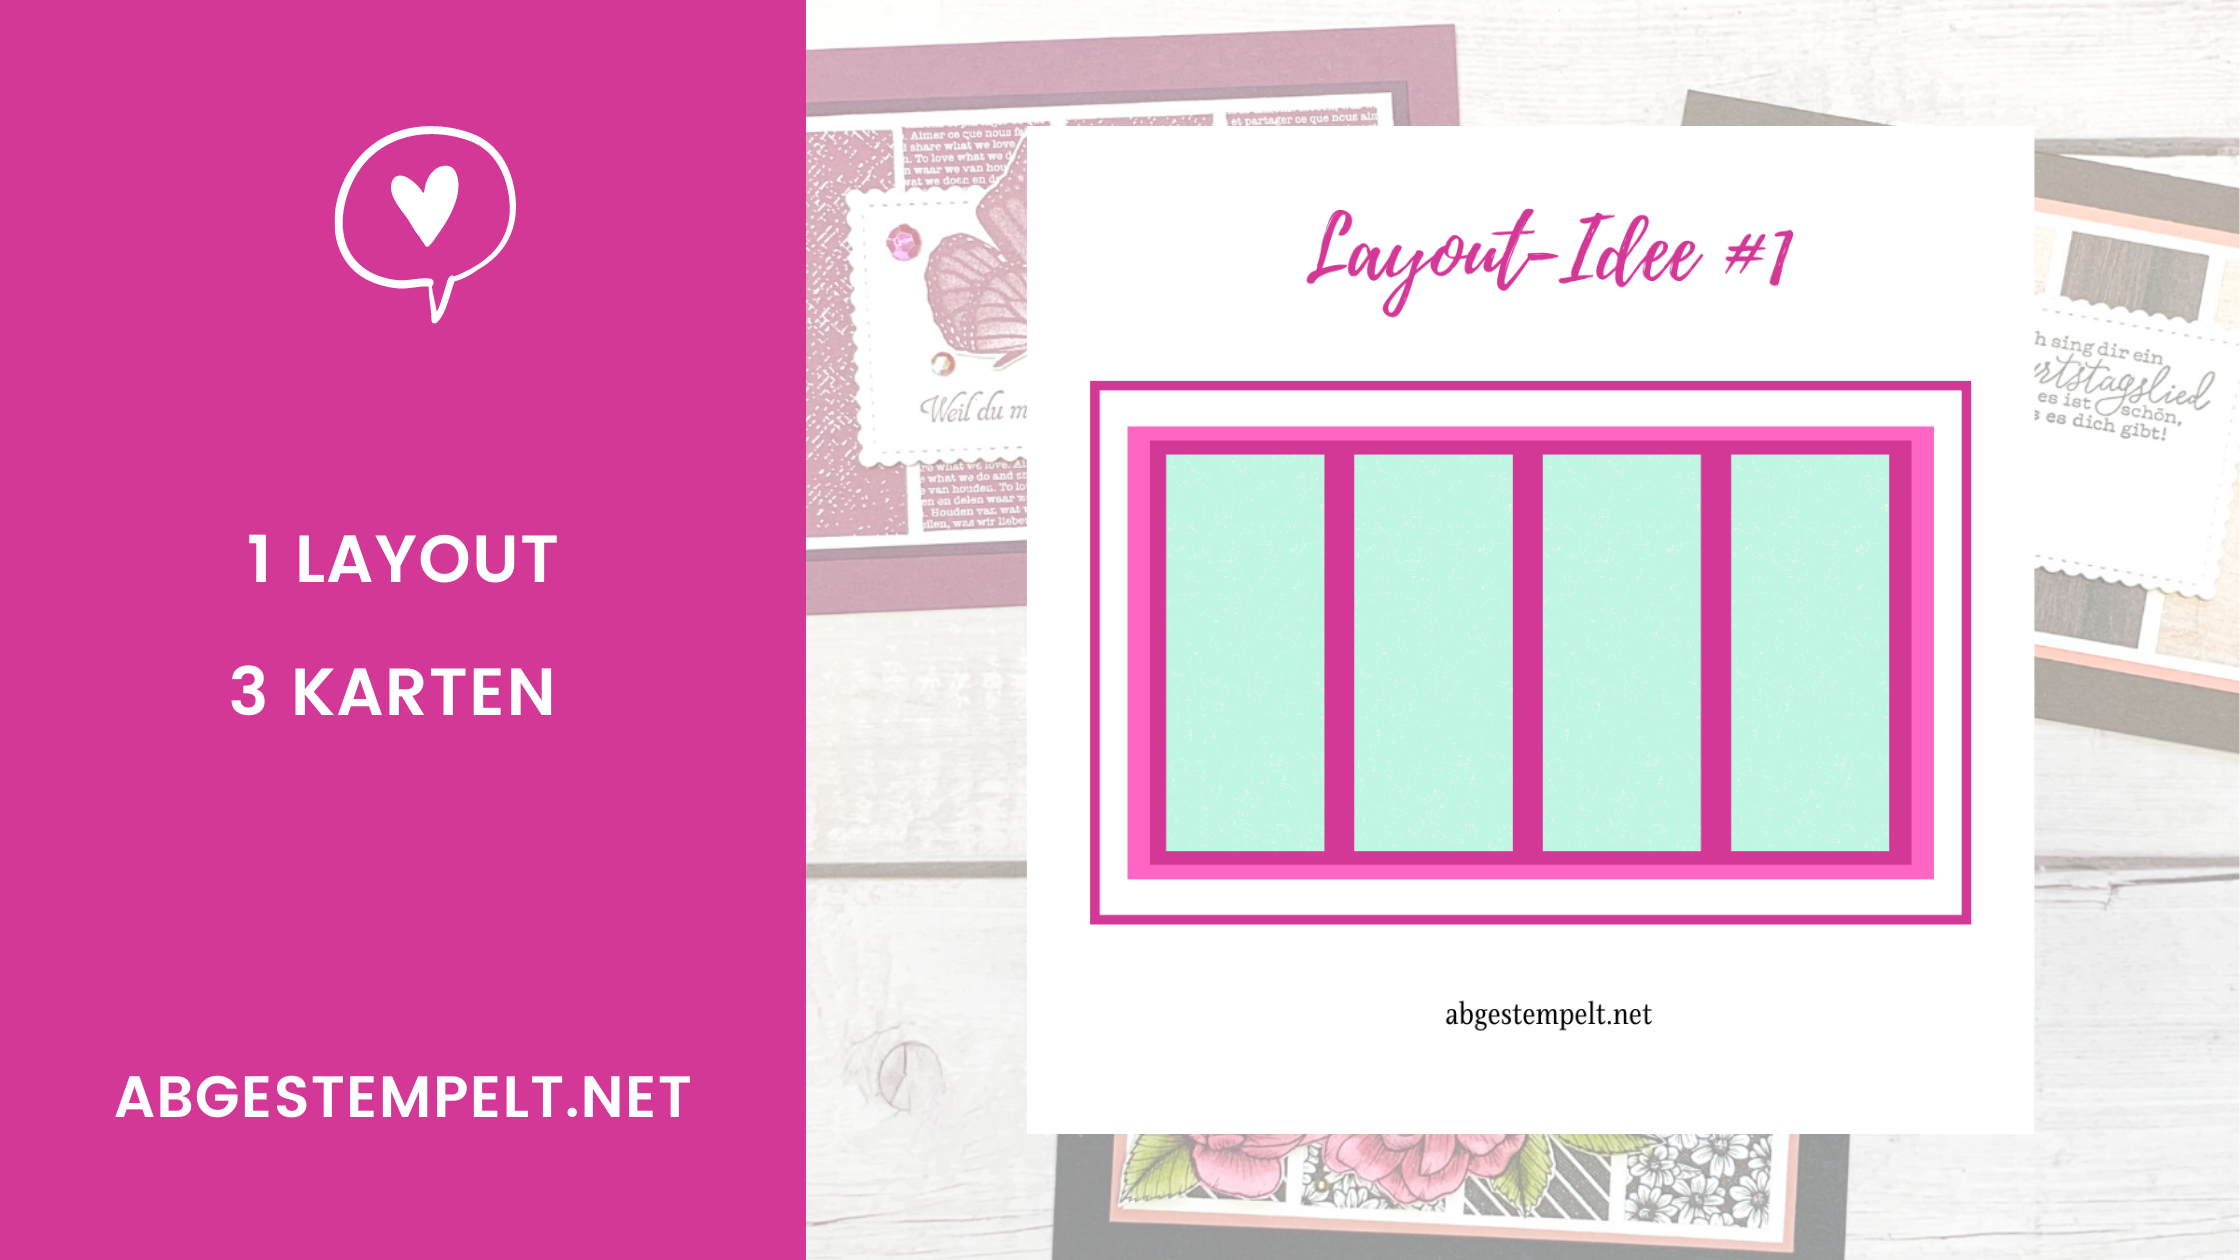 abgestempelt karten layout idee #1 blog stampin up